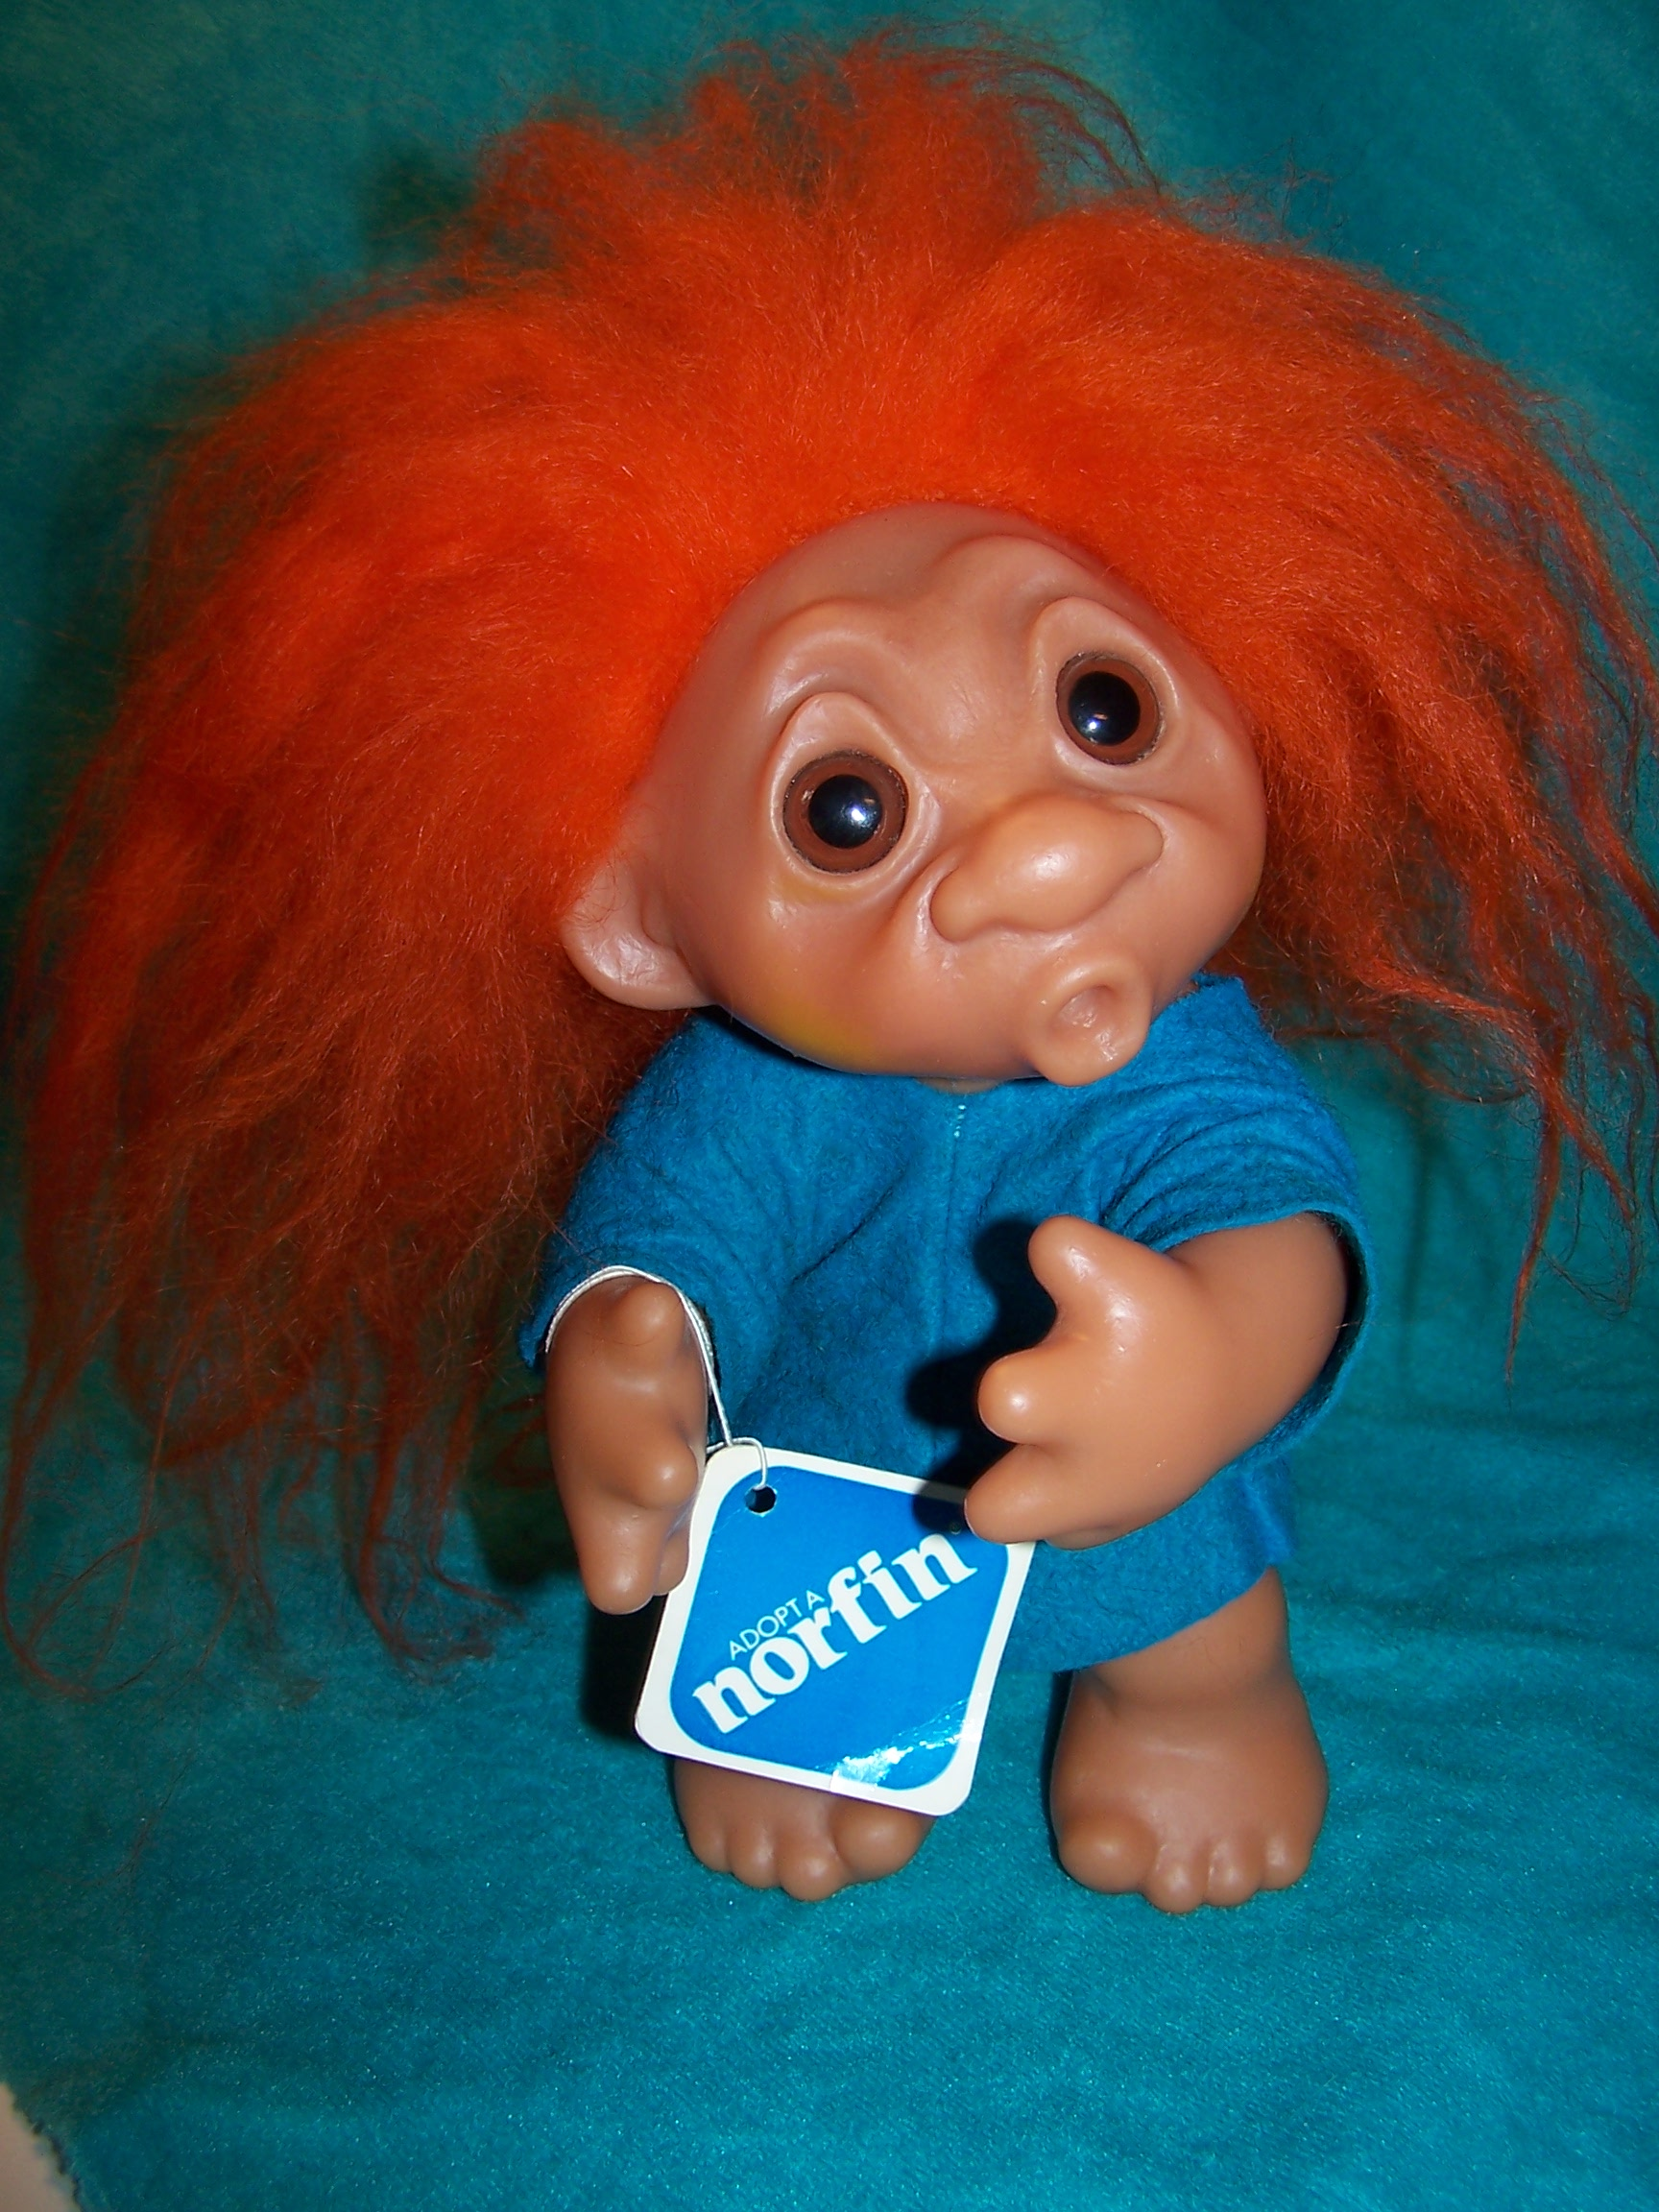 Norfin Troll Doll Grandpa, Thomas Dam, 1977 Denmark